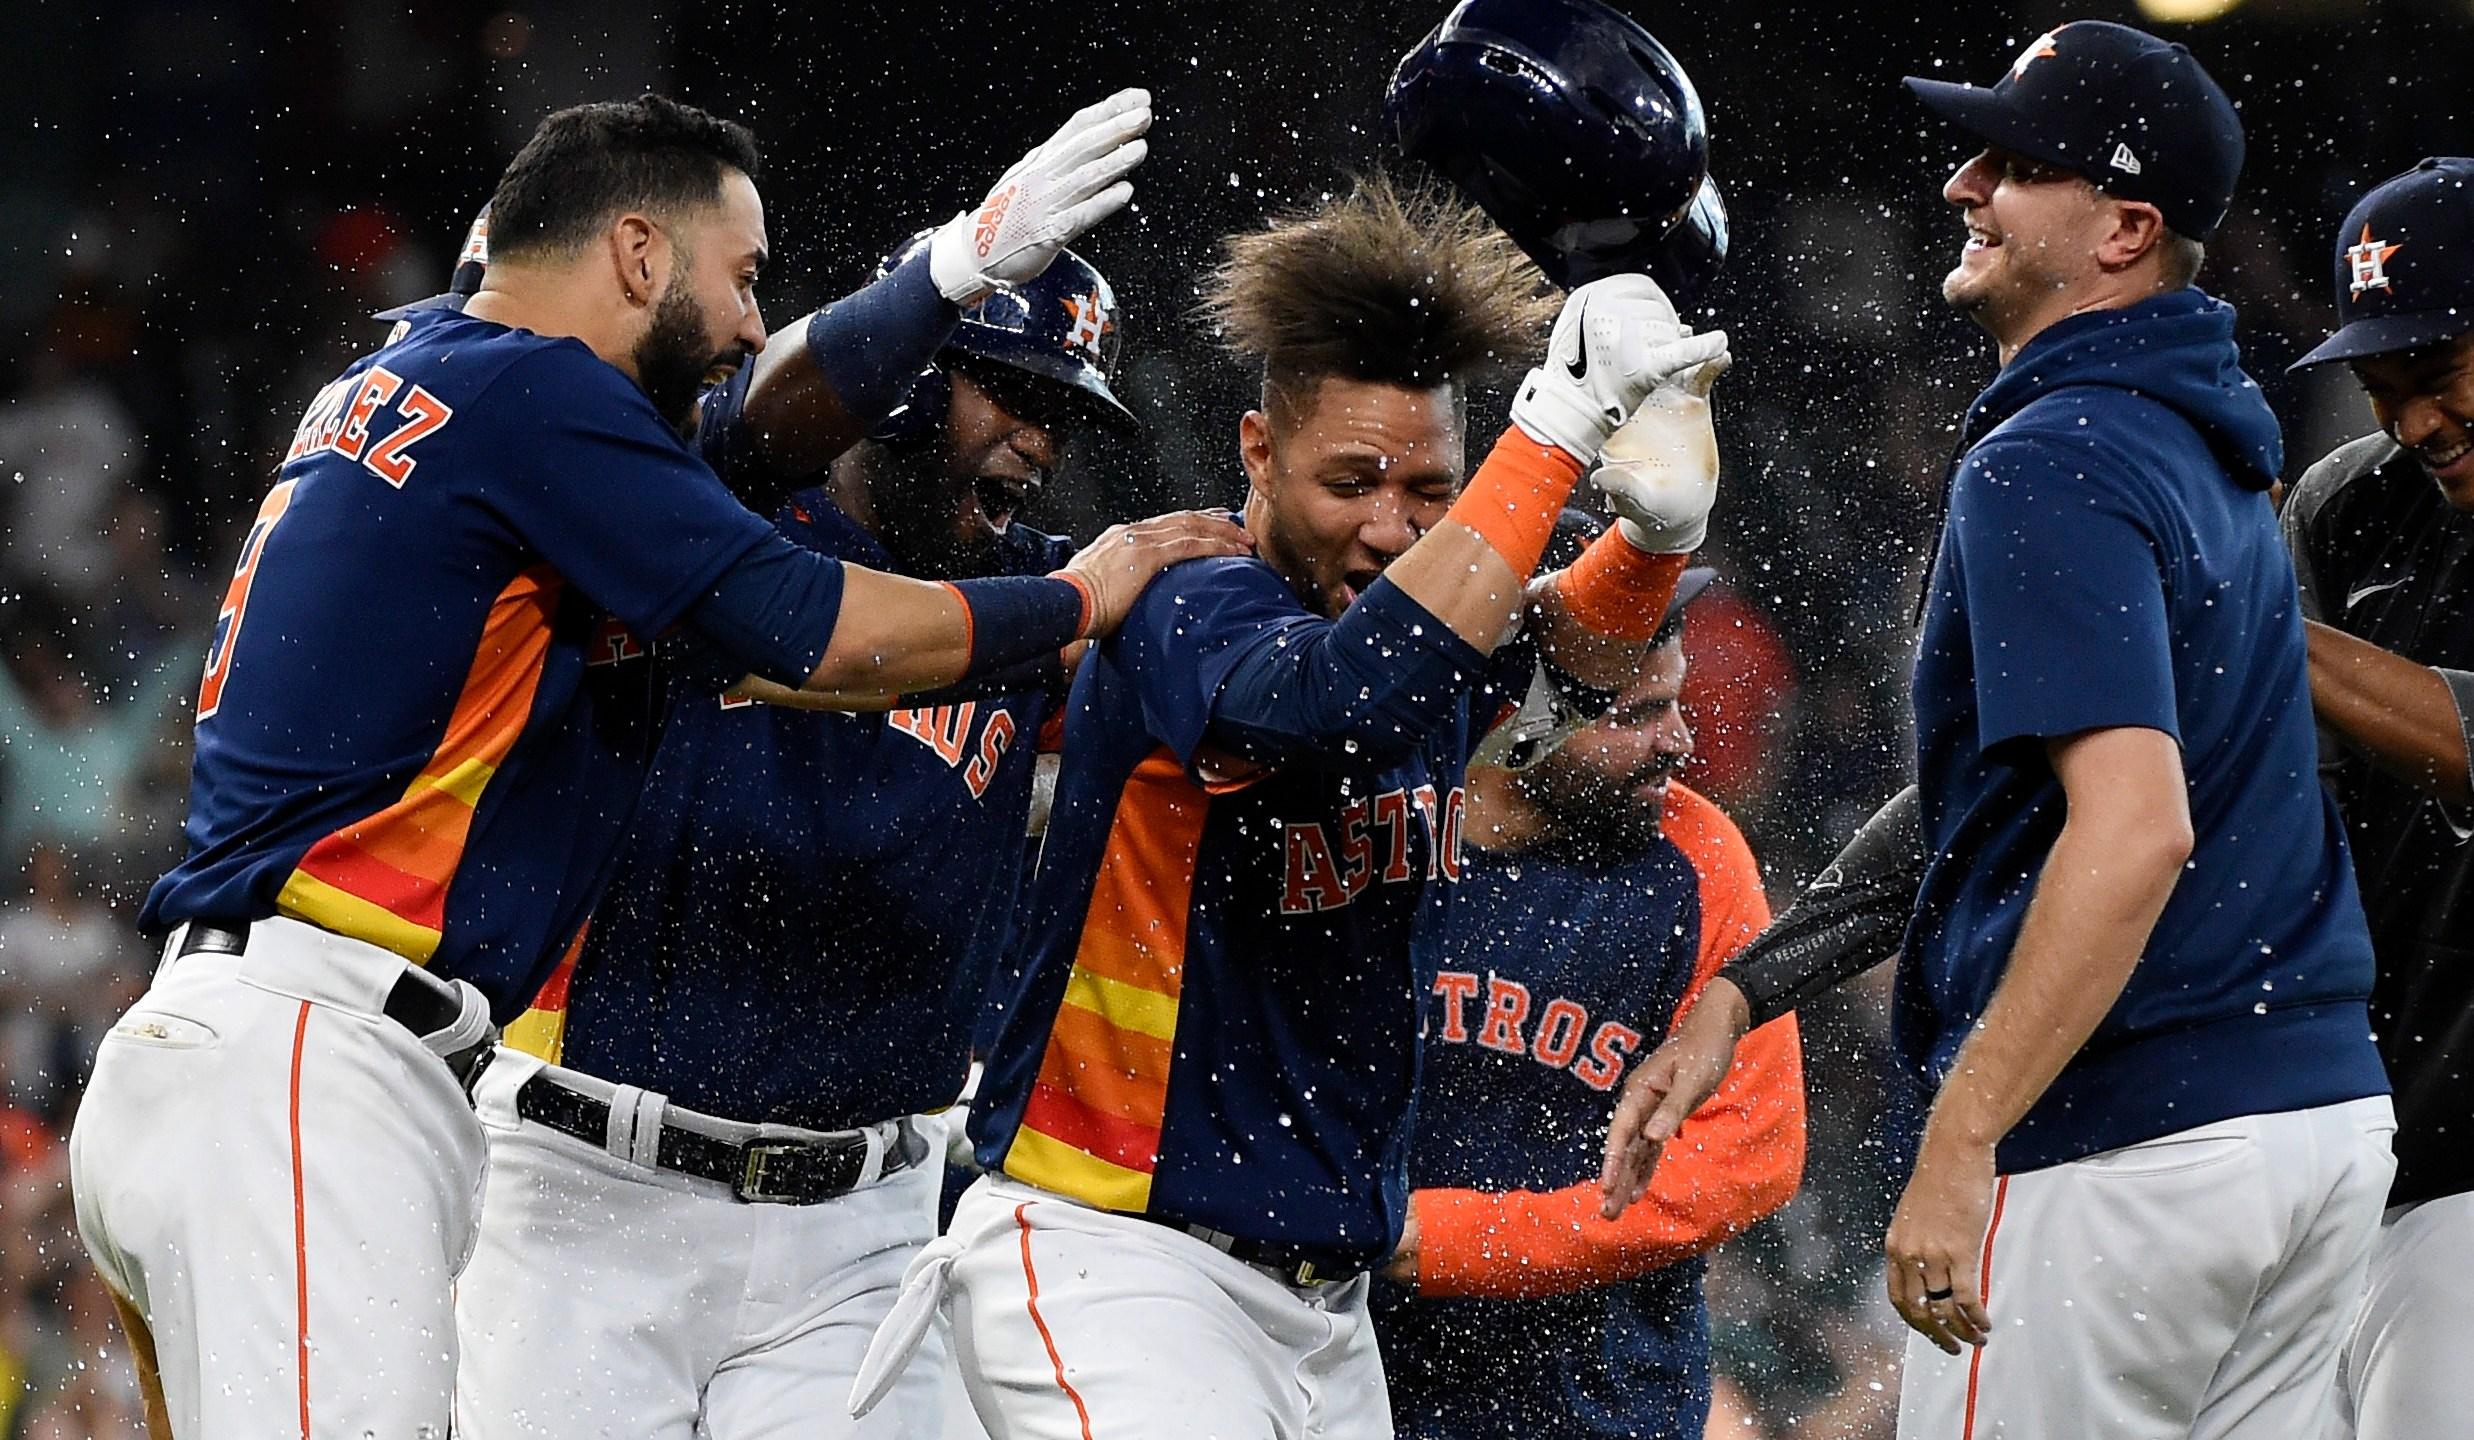 Astros celebrate win